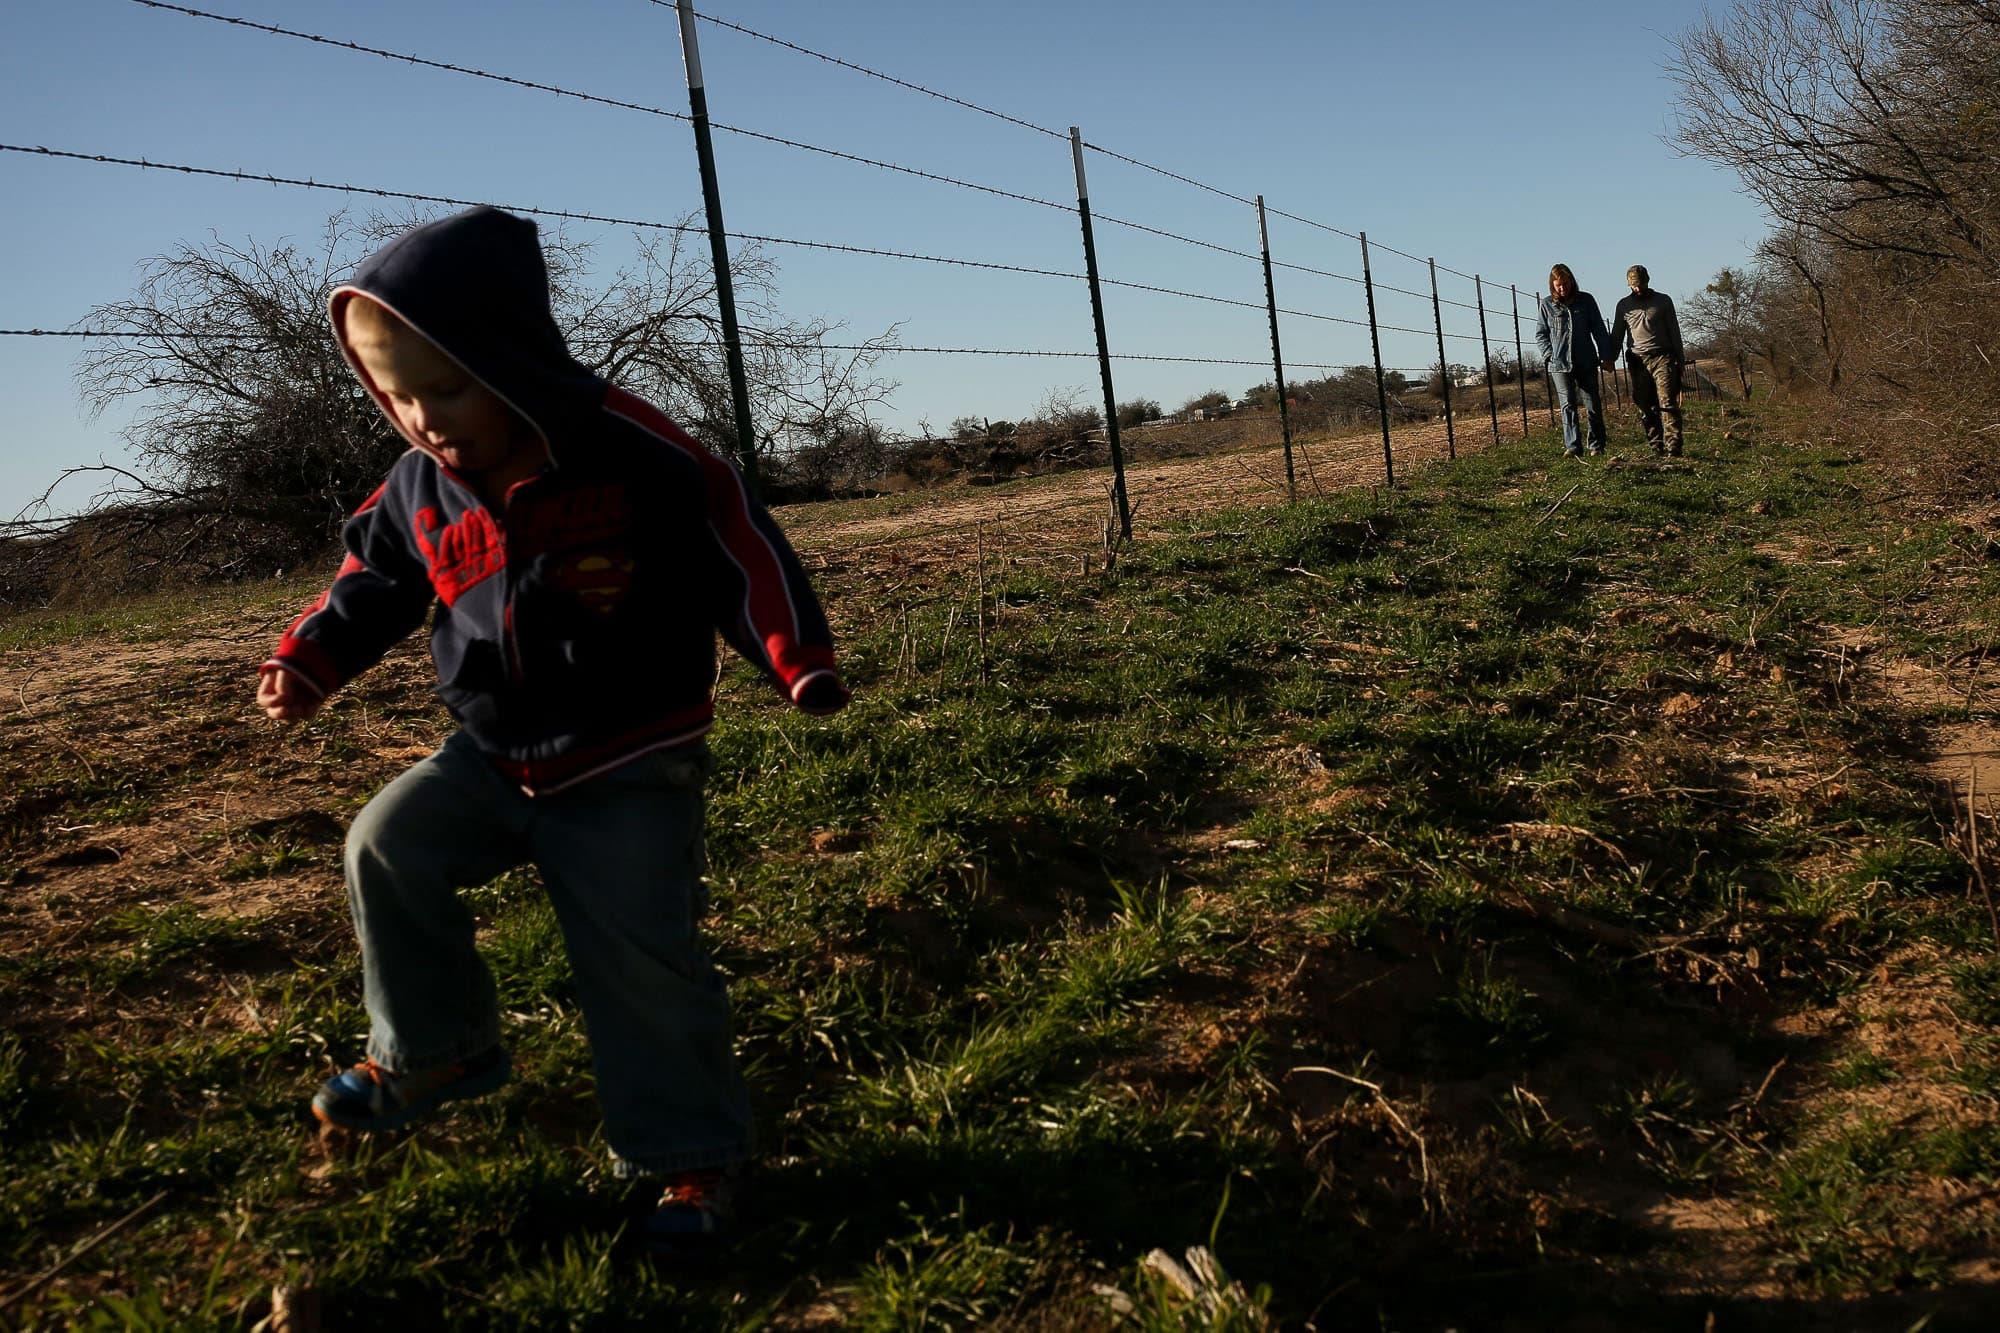 family takes a walk on their property